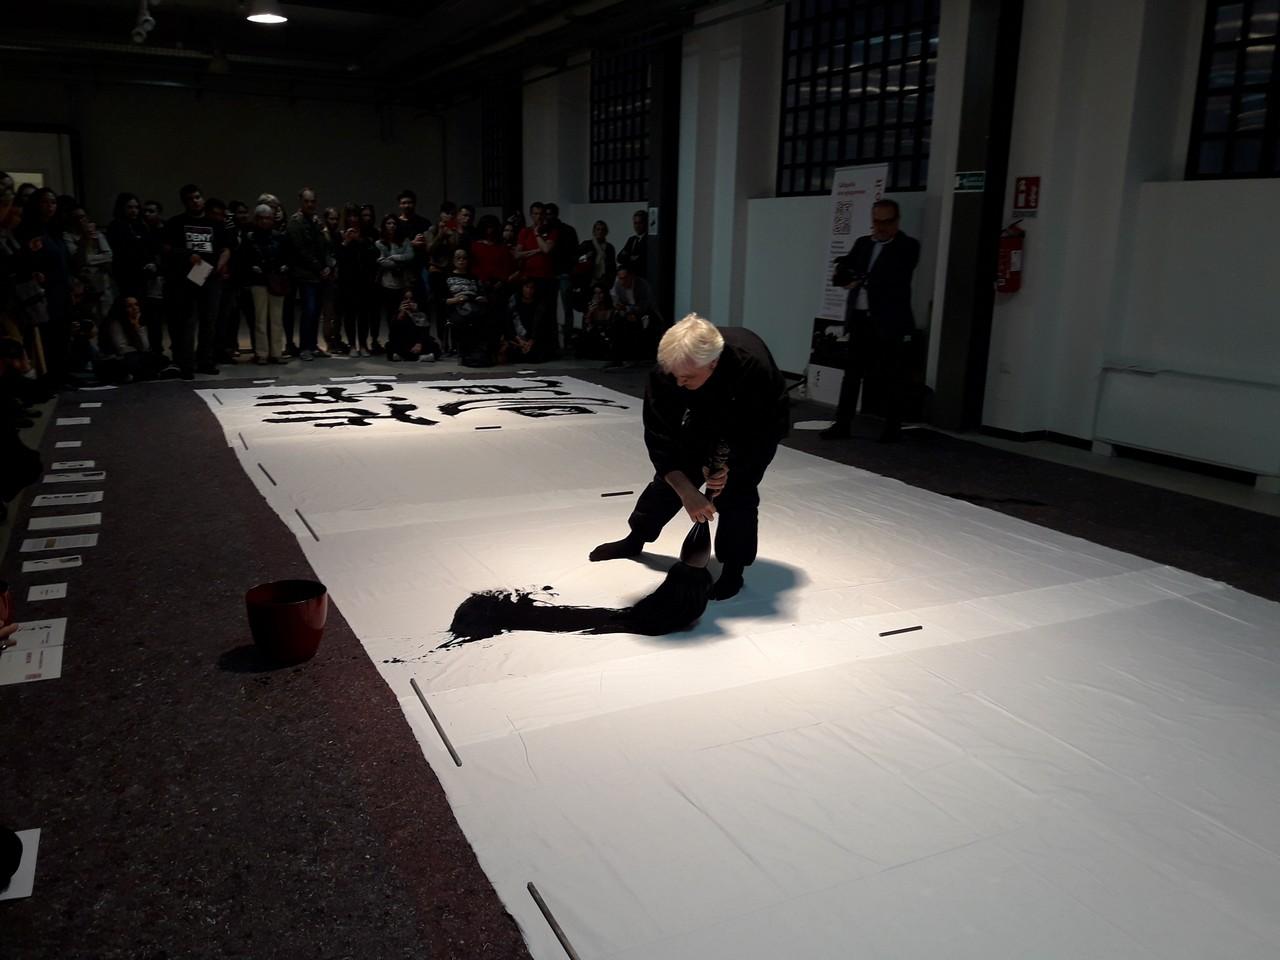 JapanFestival-Milano2018-fotoPagineZeni_030